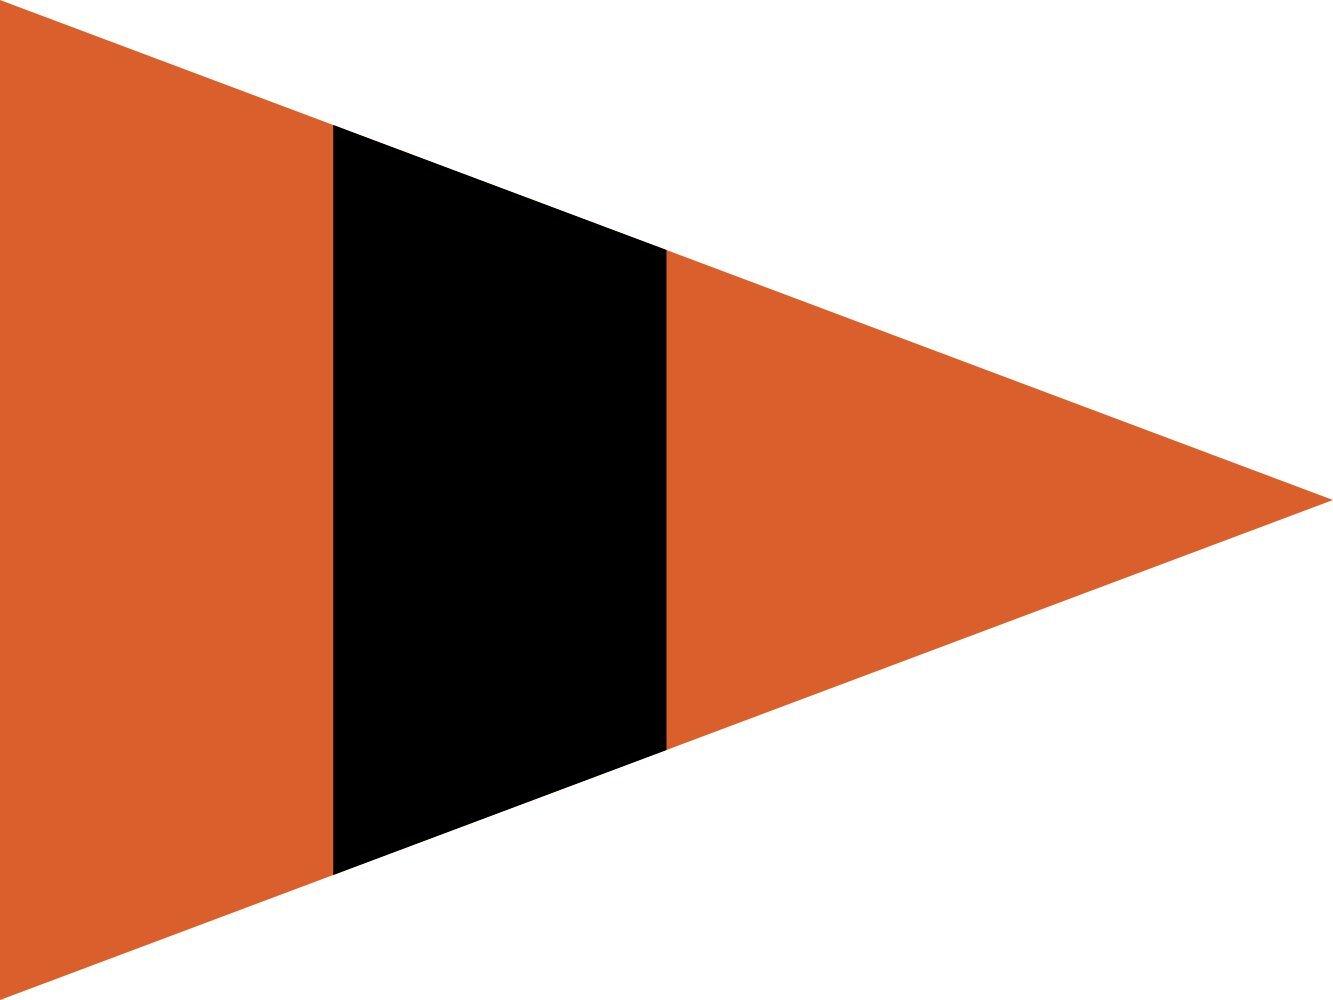 0.06m/² 21x28cm f/ür Flags Autofahnen Querformat Fahne DIPLOMAT Flagge Feldj/äger Kompaniechef Bundeswehr